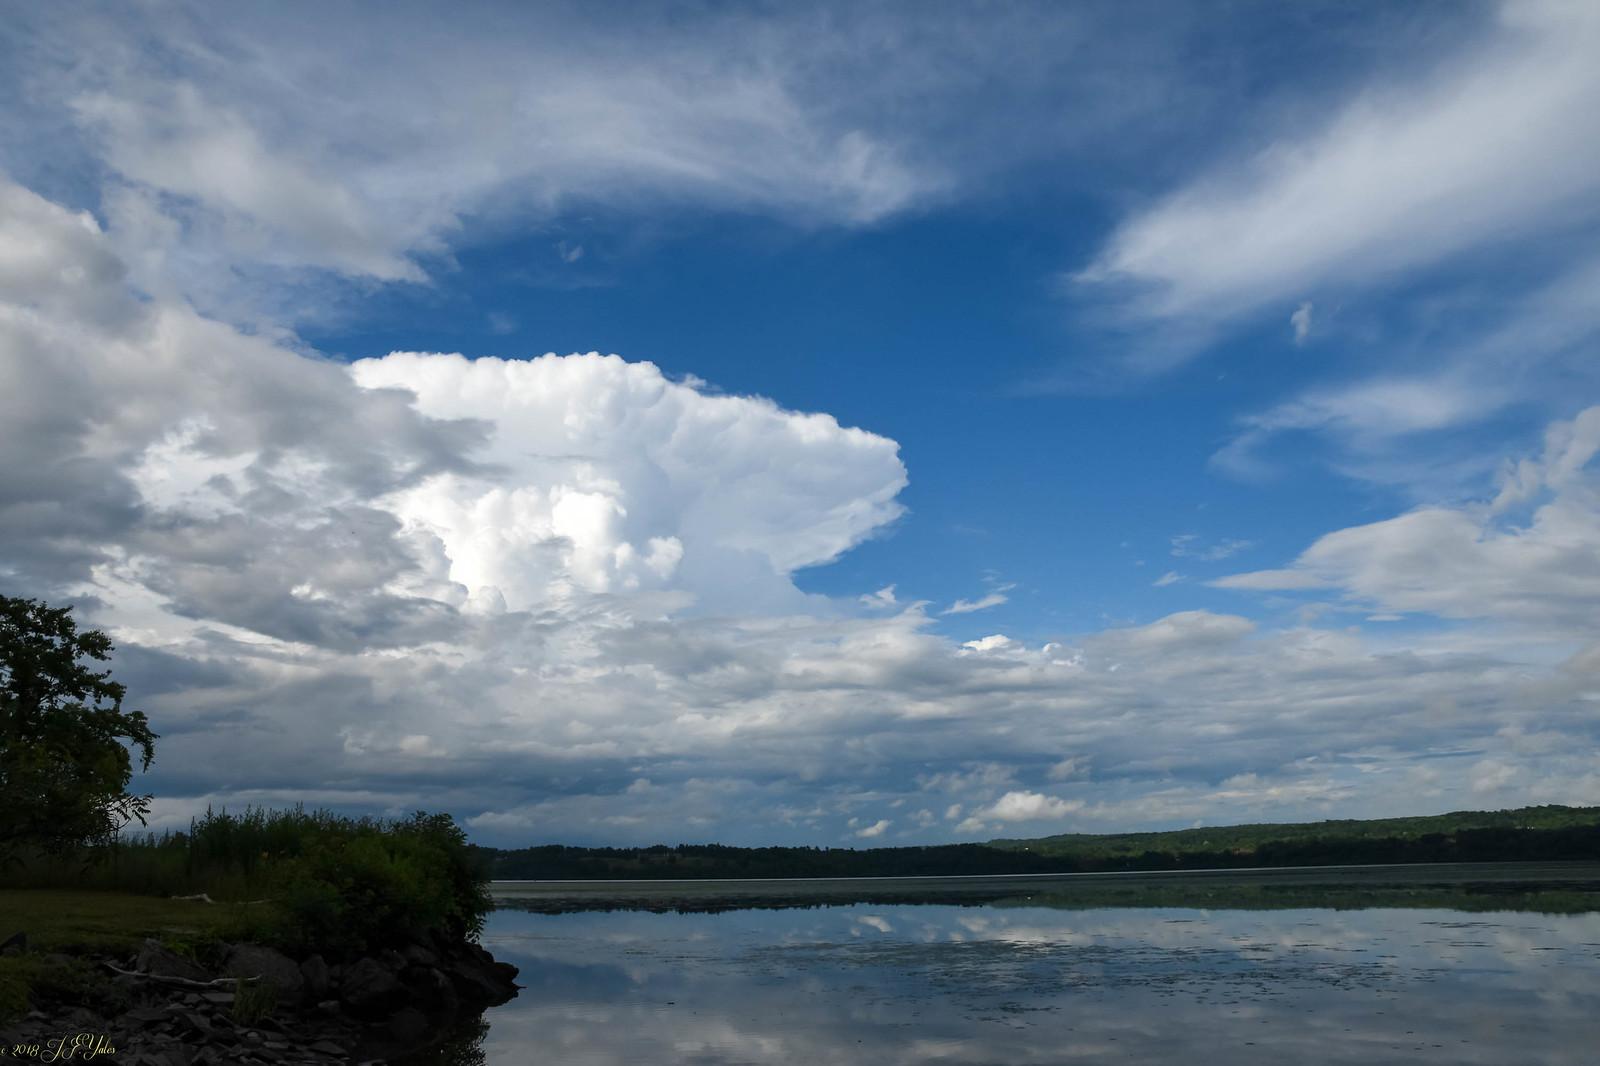 Storm cloud over Hudson